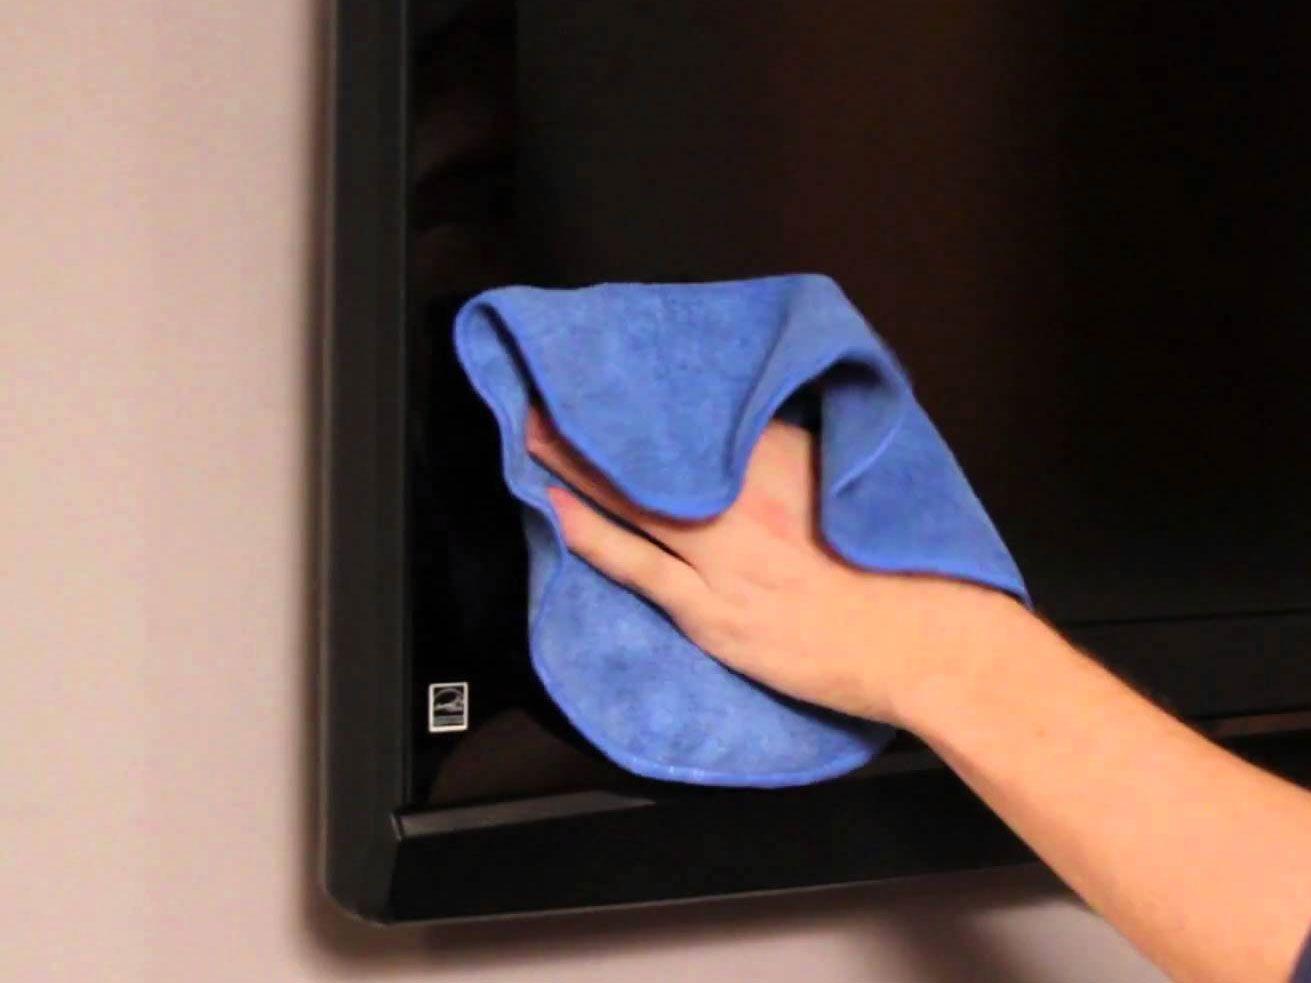 onderhoud flatscreen tv ochtend schoonmaakwerk. Black Bedroom Furniture Sets. Home Design Ideas